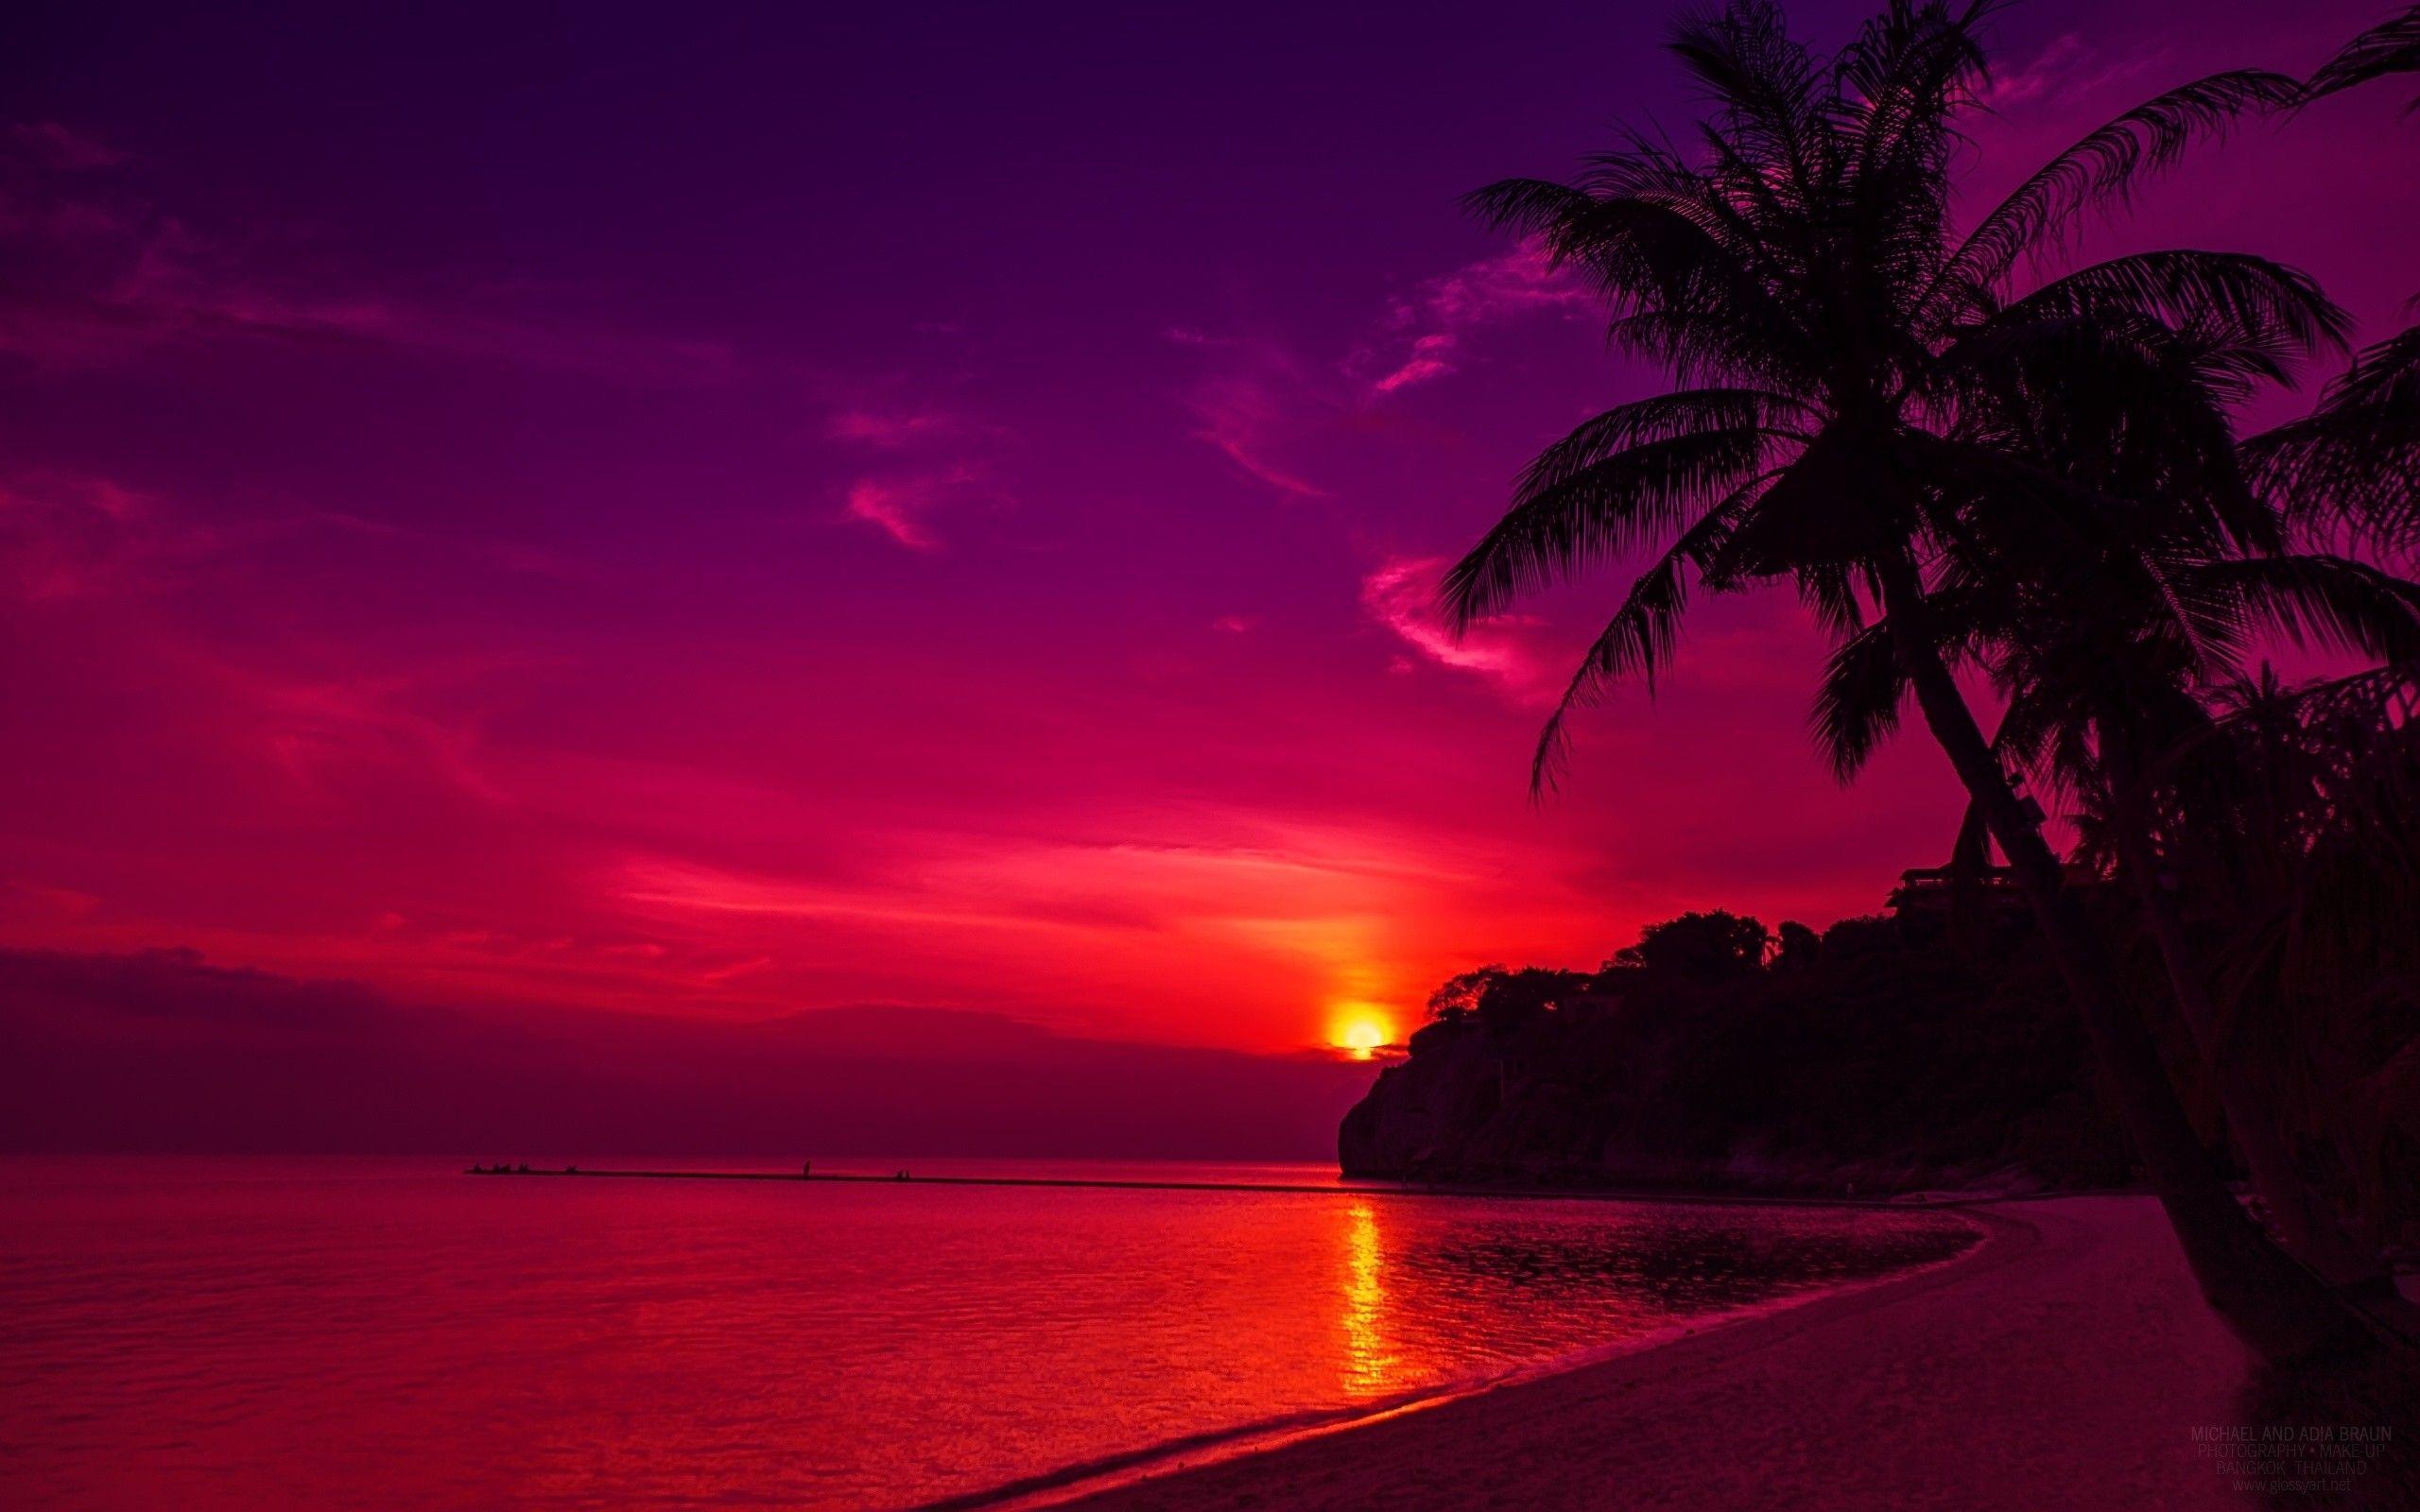 Aesthetic Sunset Desktop Wallpapers Top Free Aesthetic Sunset Desktop Backgrounds Wallpaperaccess